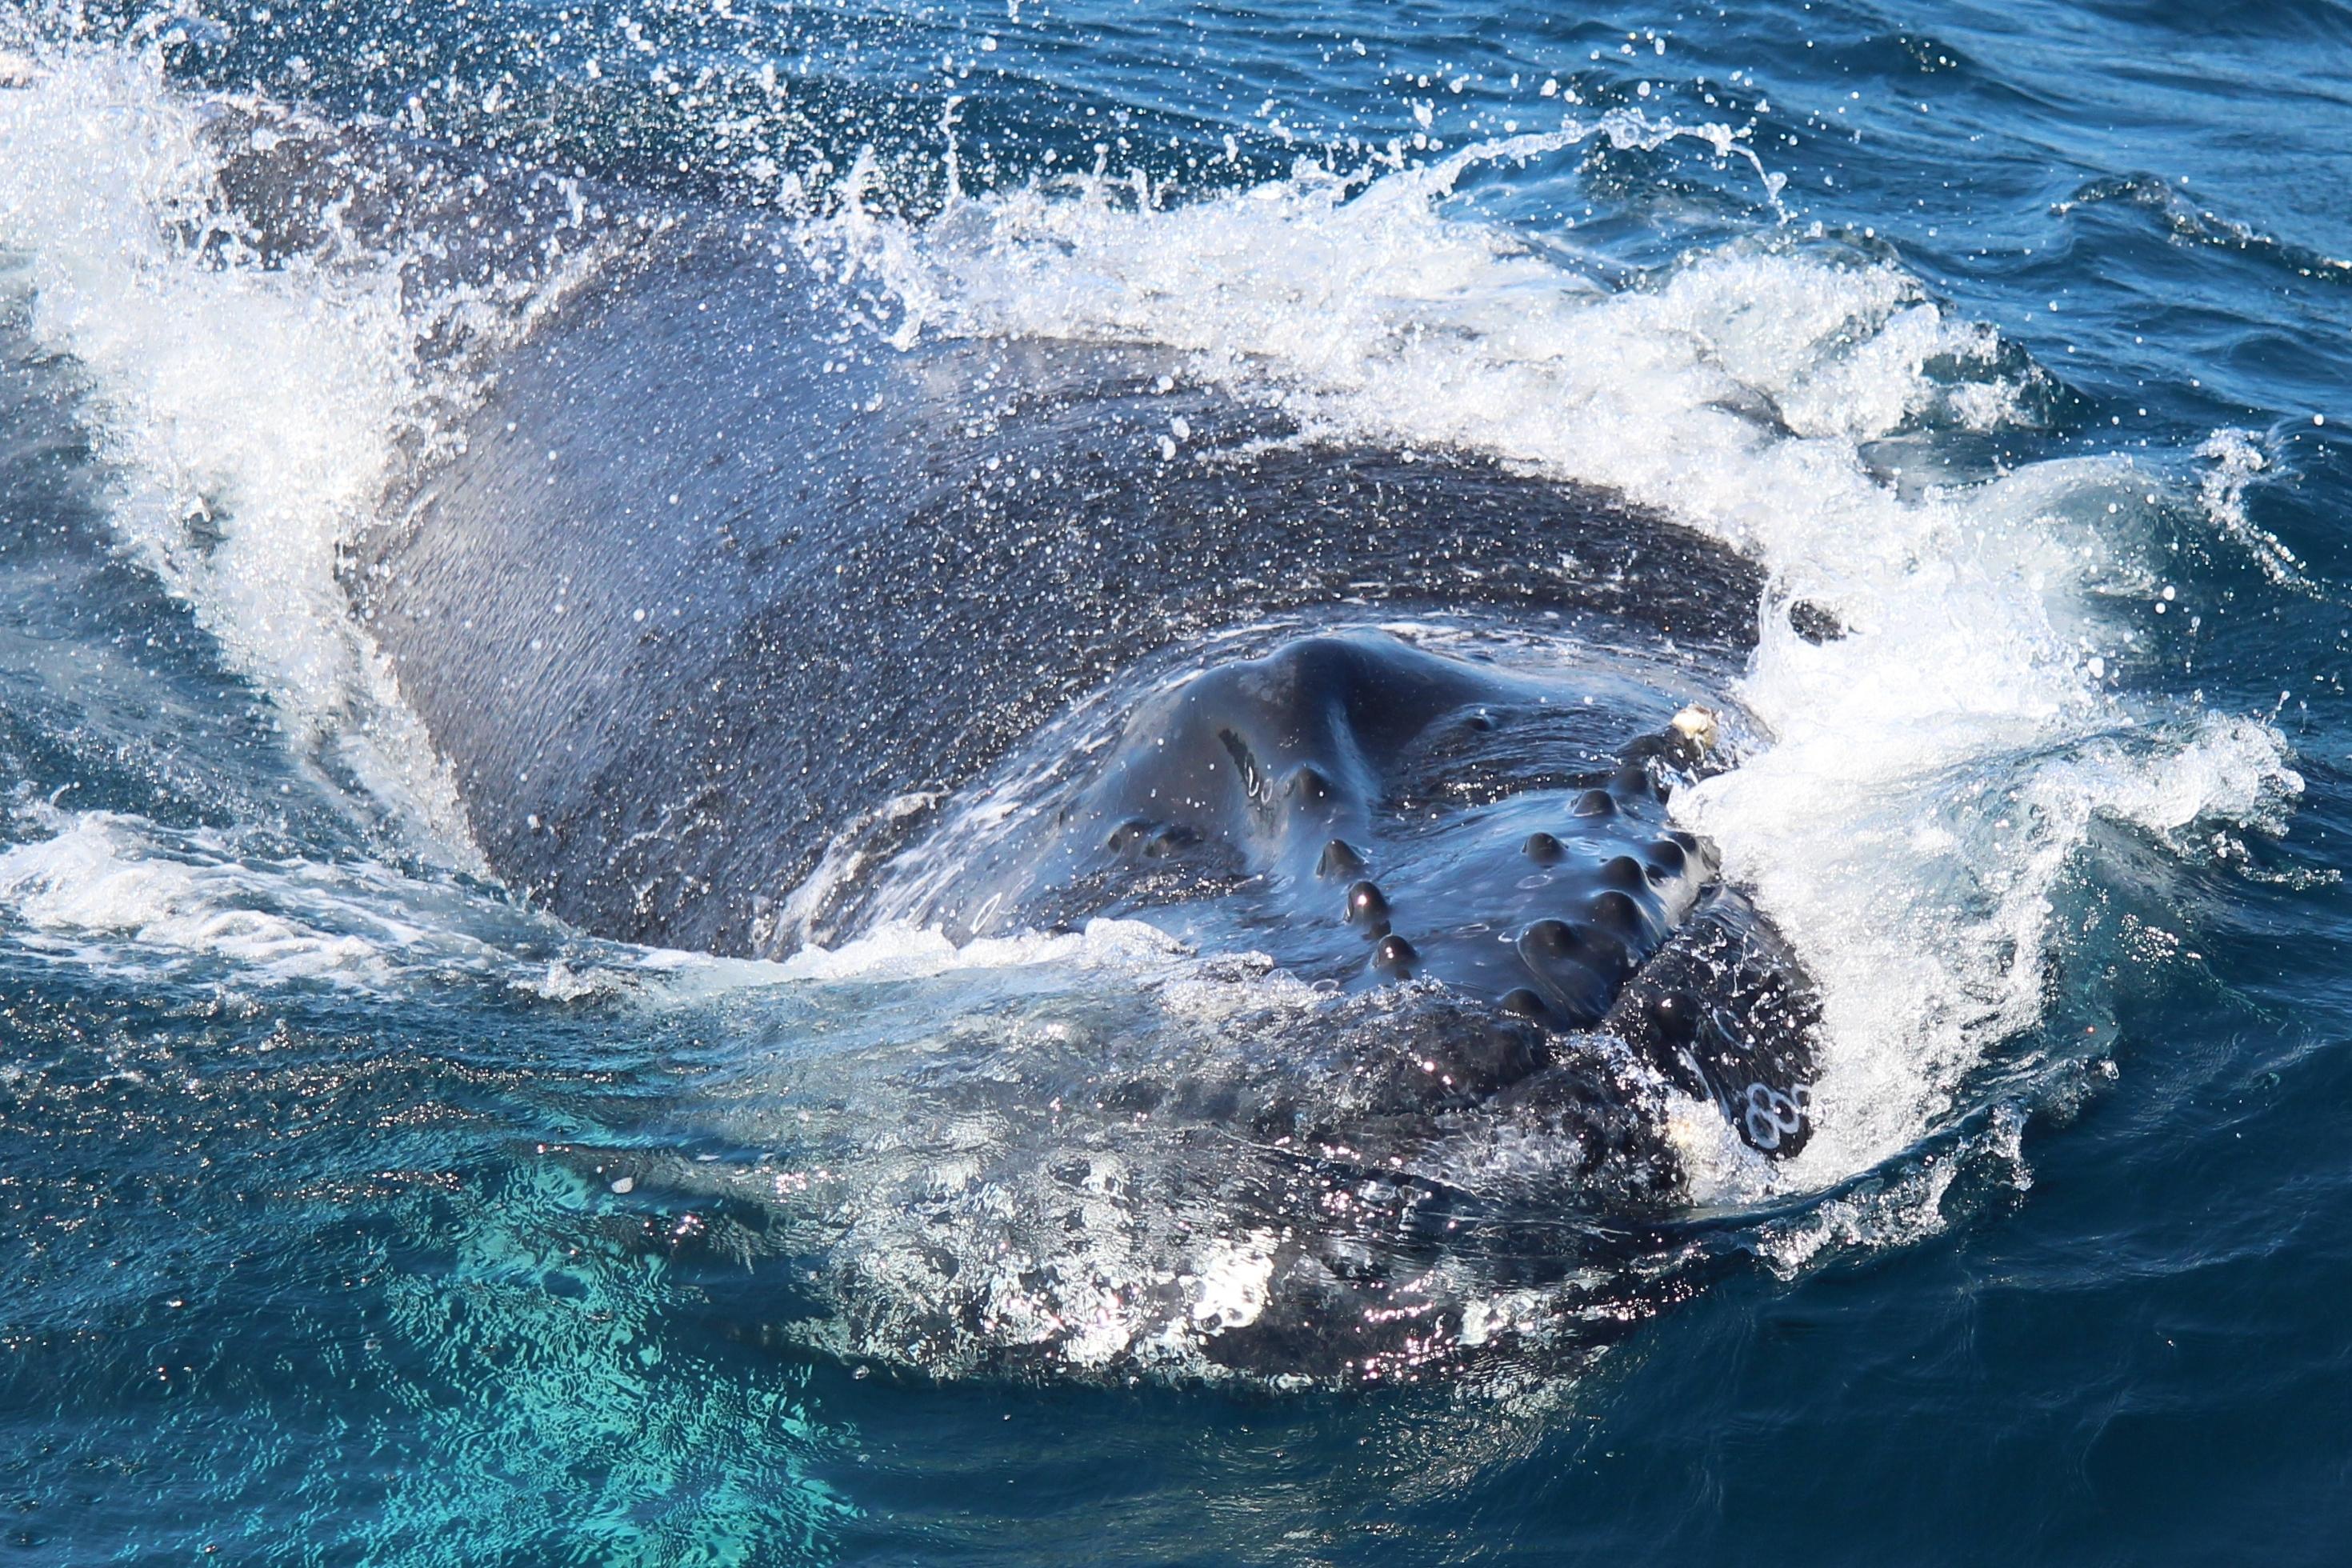 Knoten am Kopf des Buckelwals